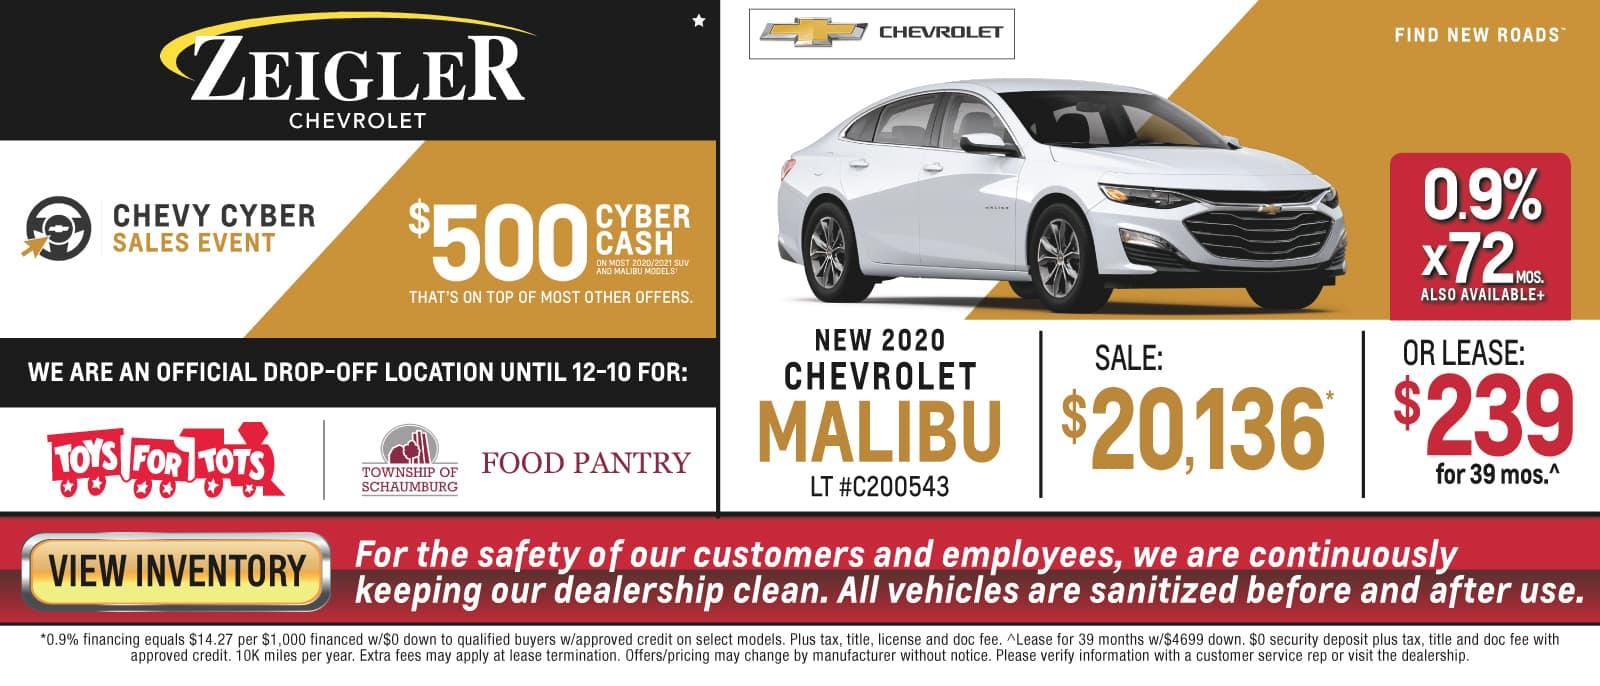 Cyber Sales Event - Malibu